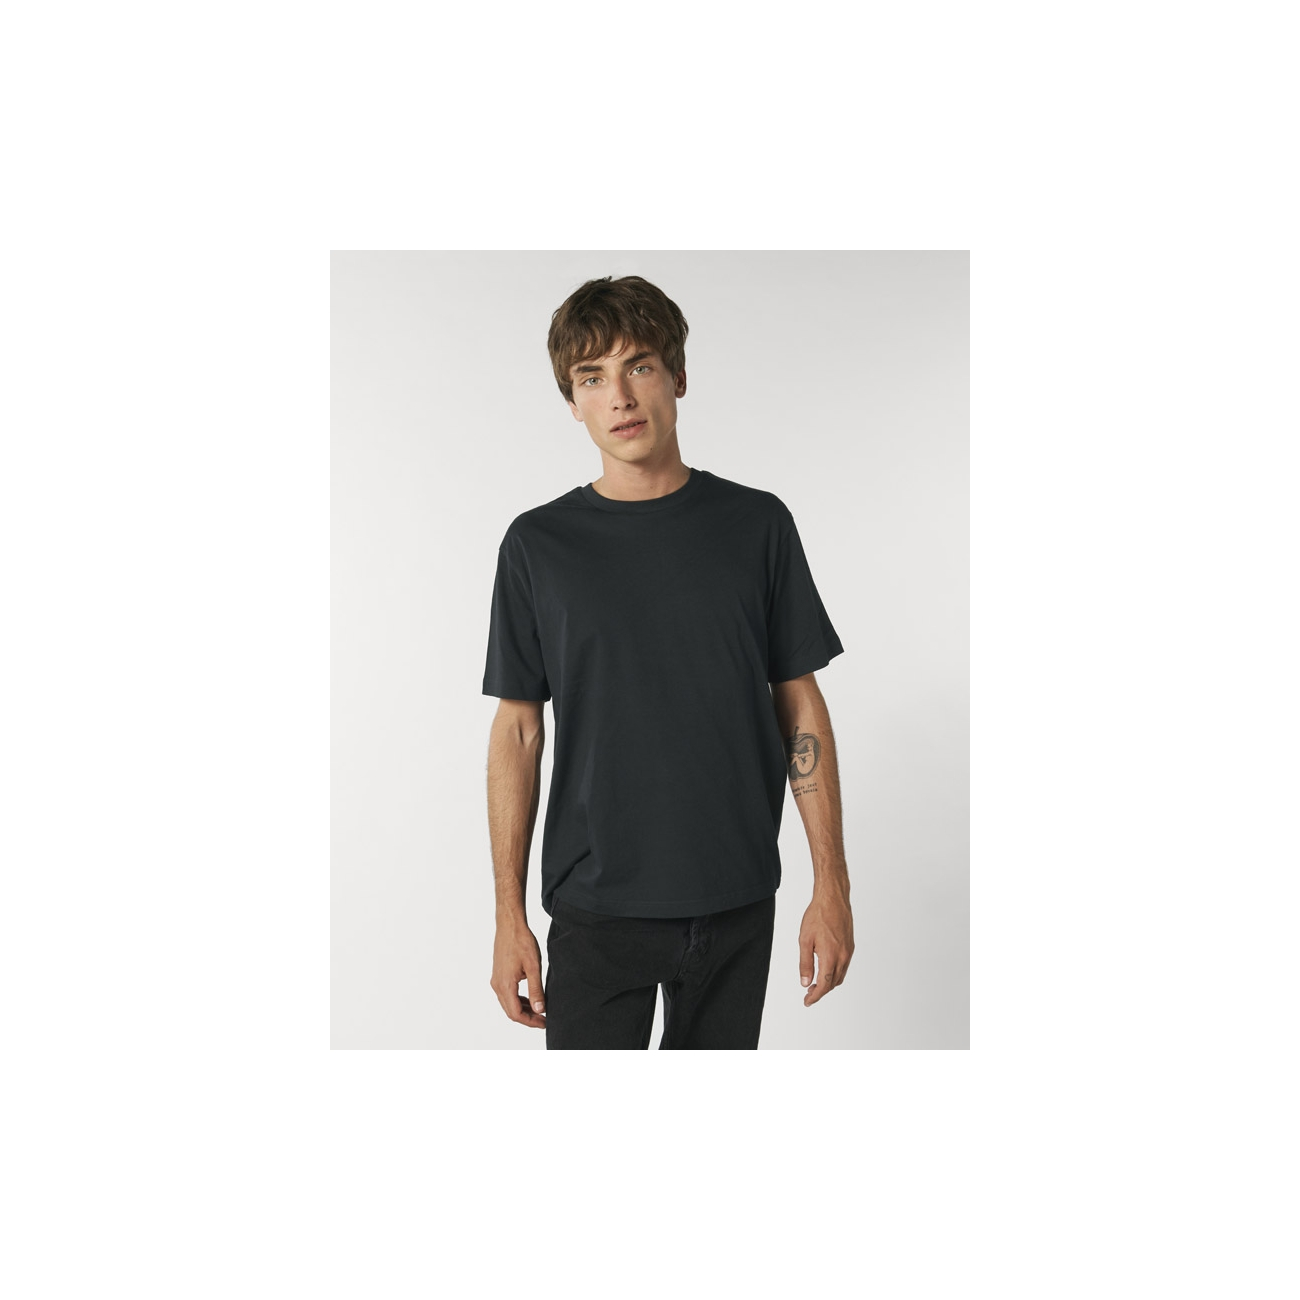 https://tee-shirt-bio.com/9699-thickbox_default/tee-shirt-coupe-ample-homme-noir.jpg